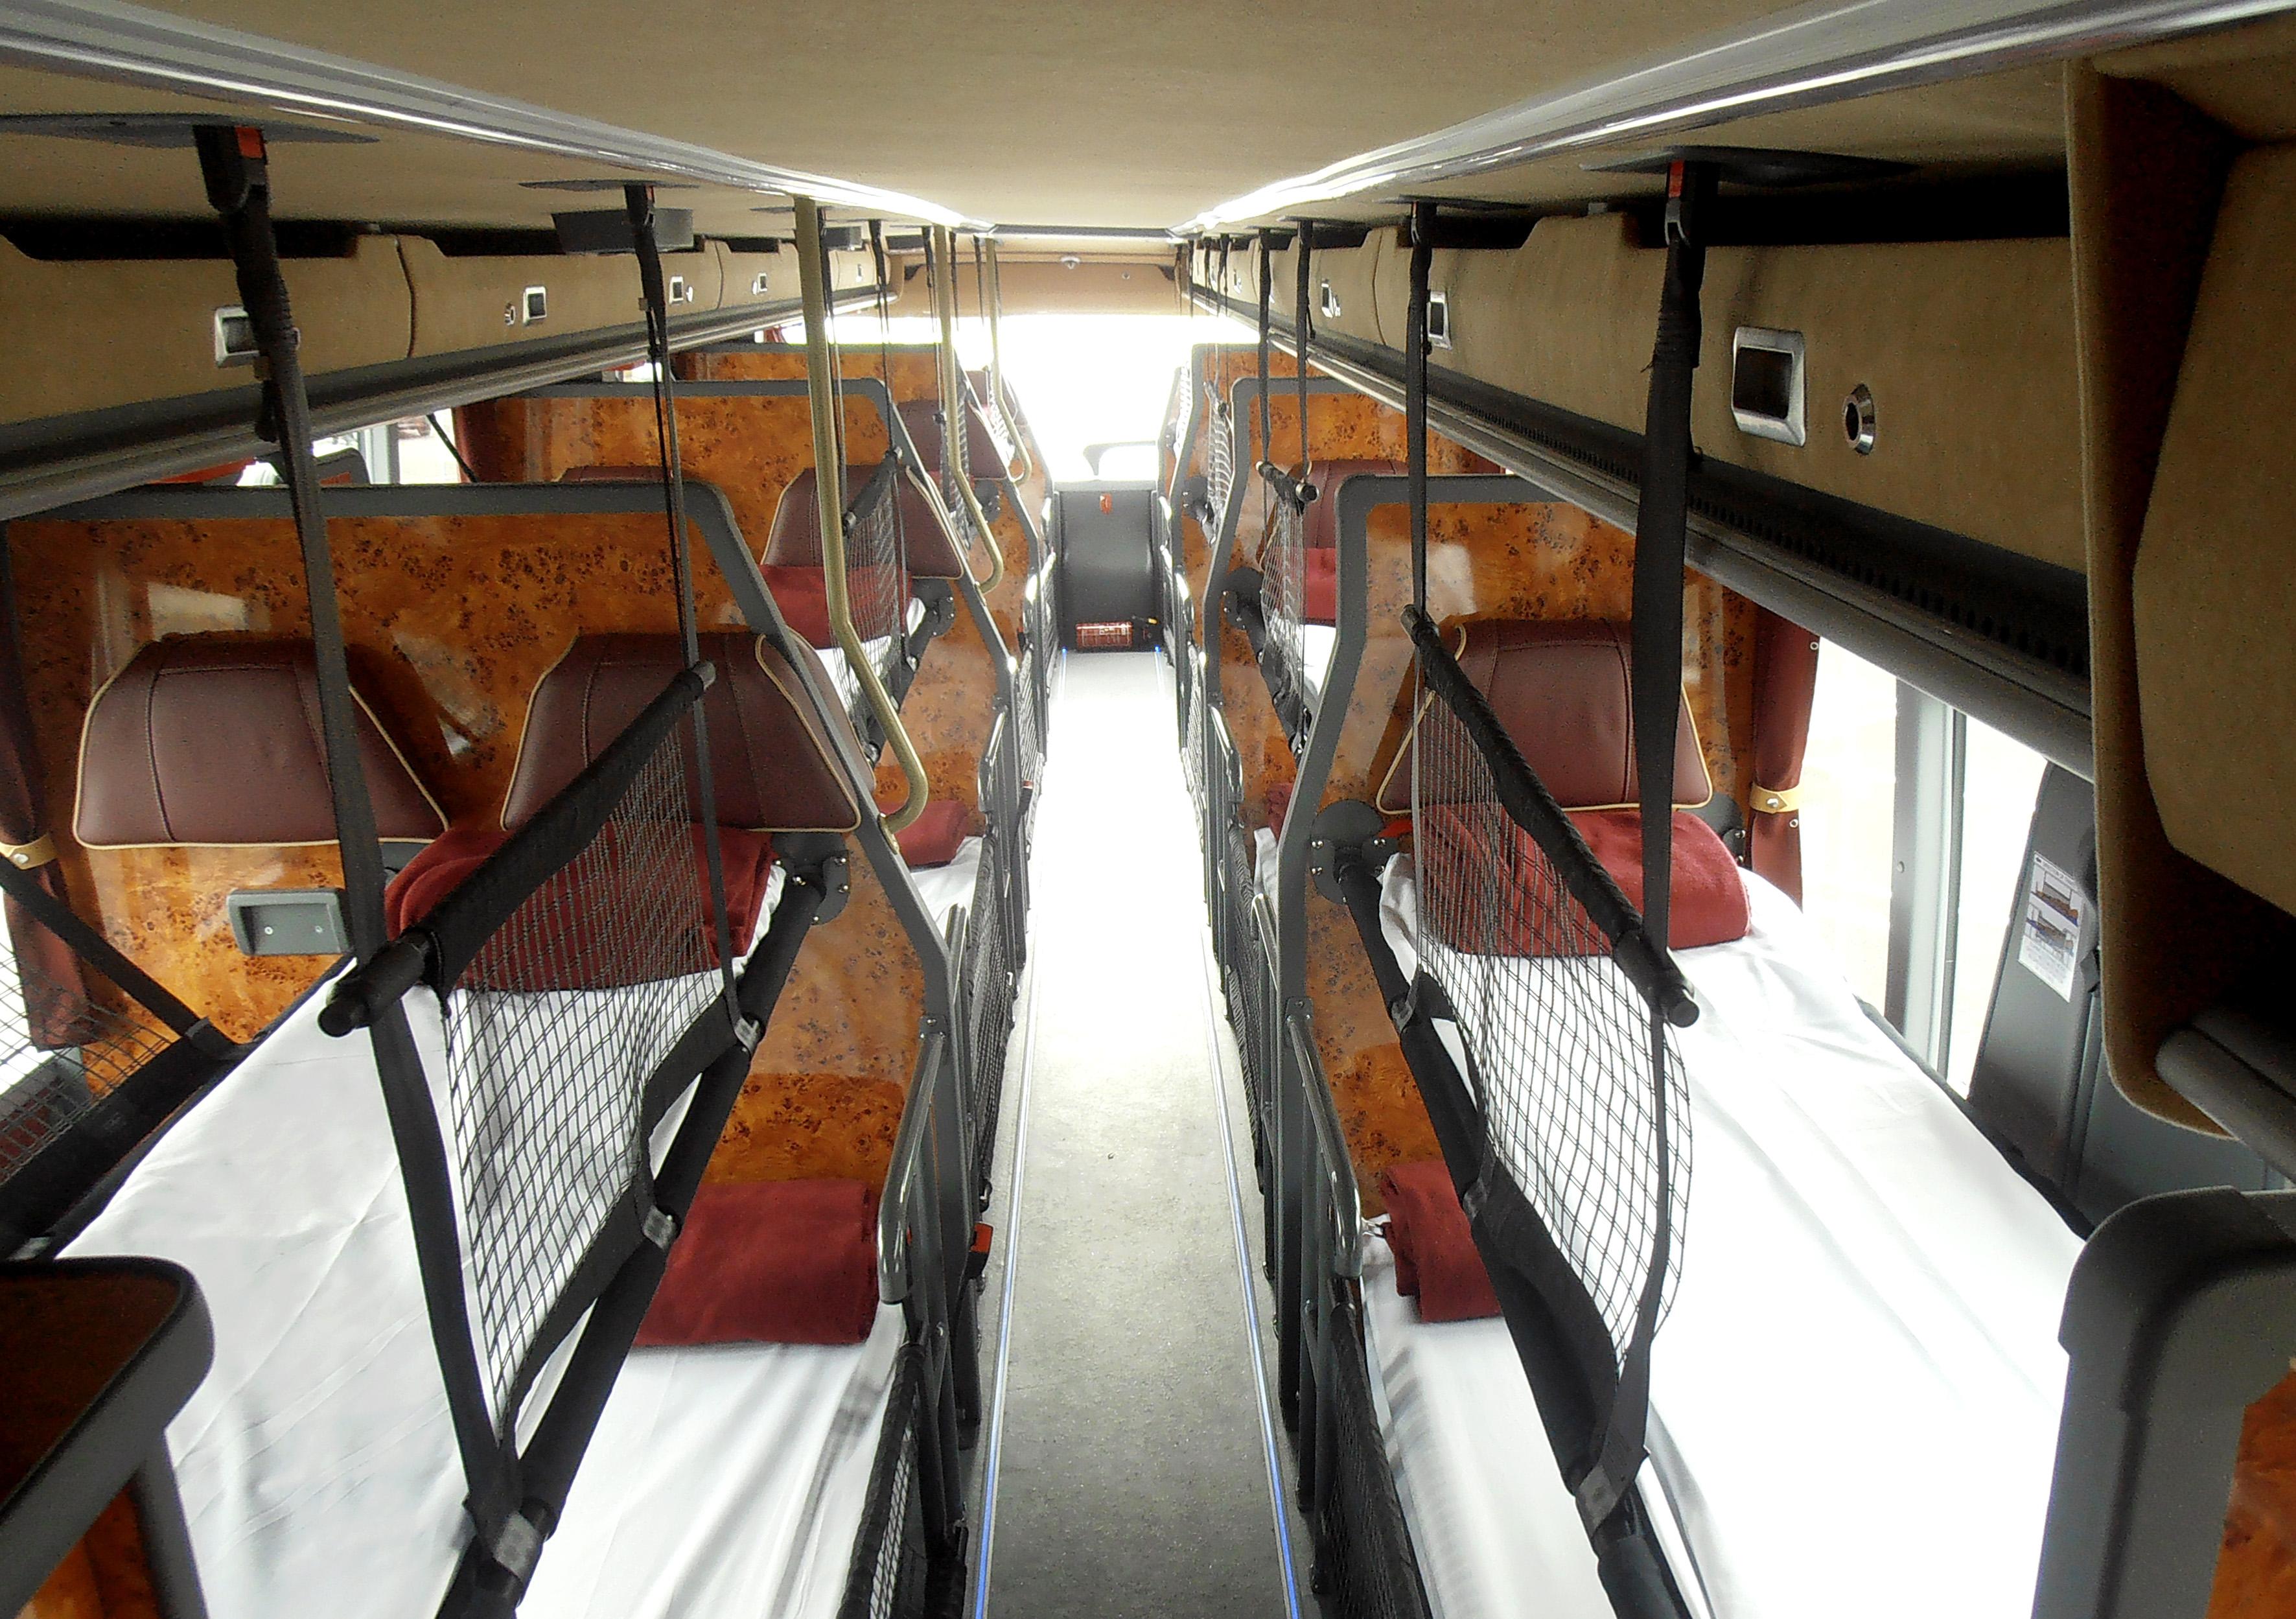 The Next Step in the Megabus Revolution | The Antiplanner